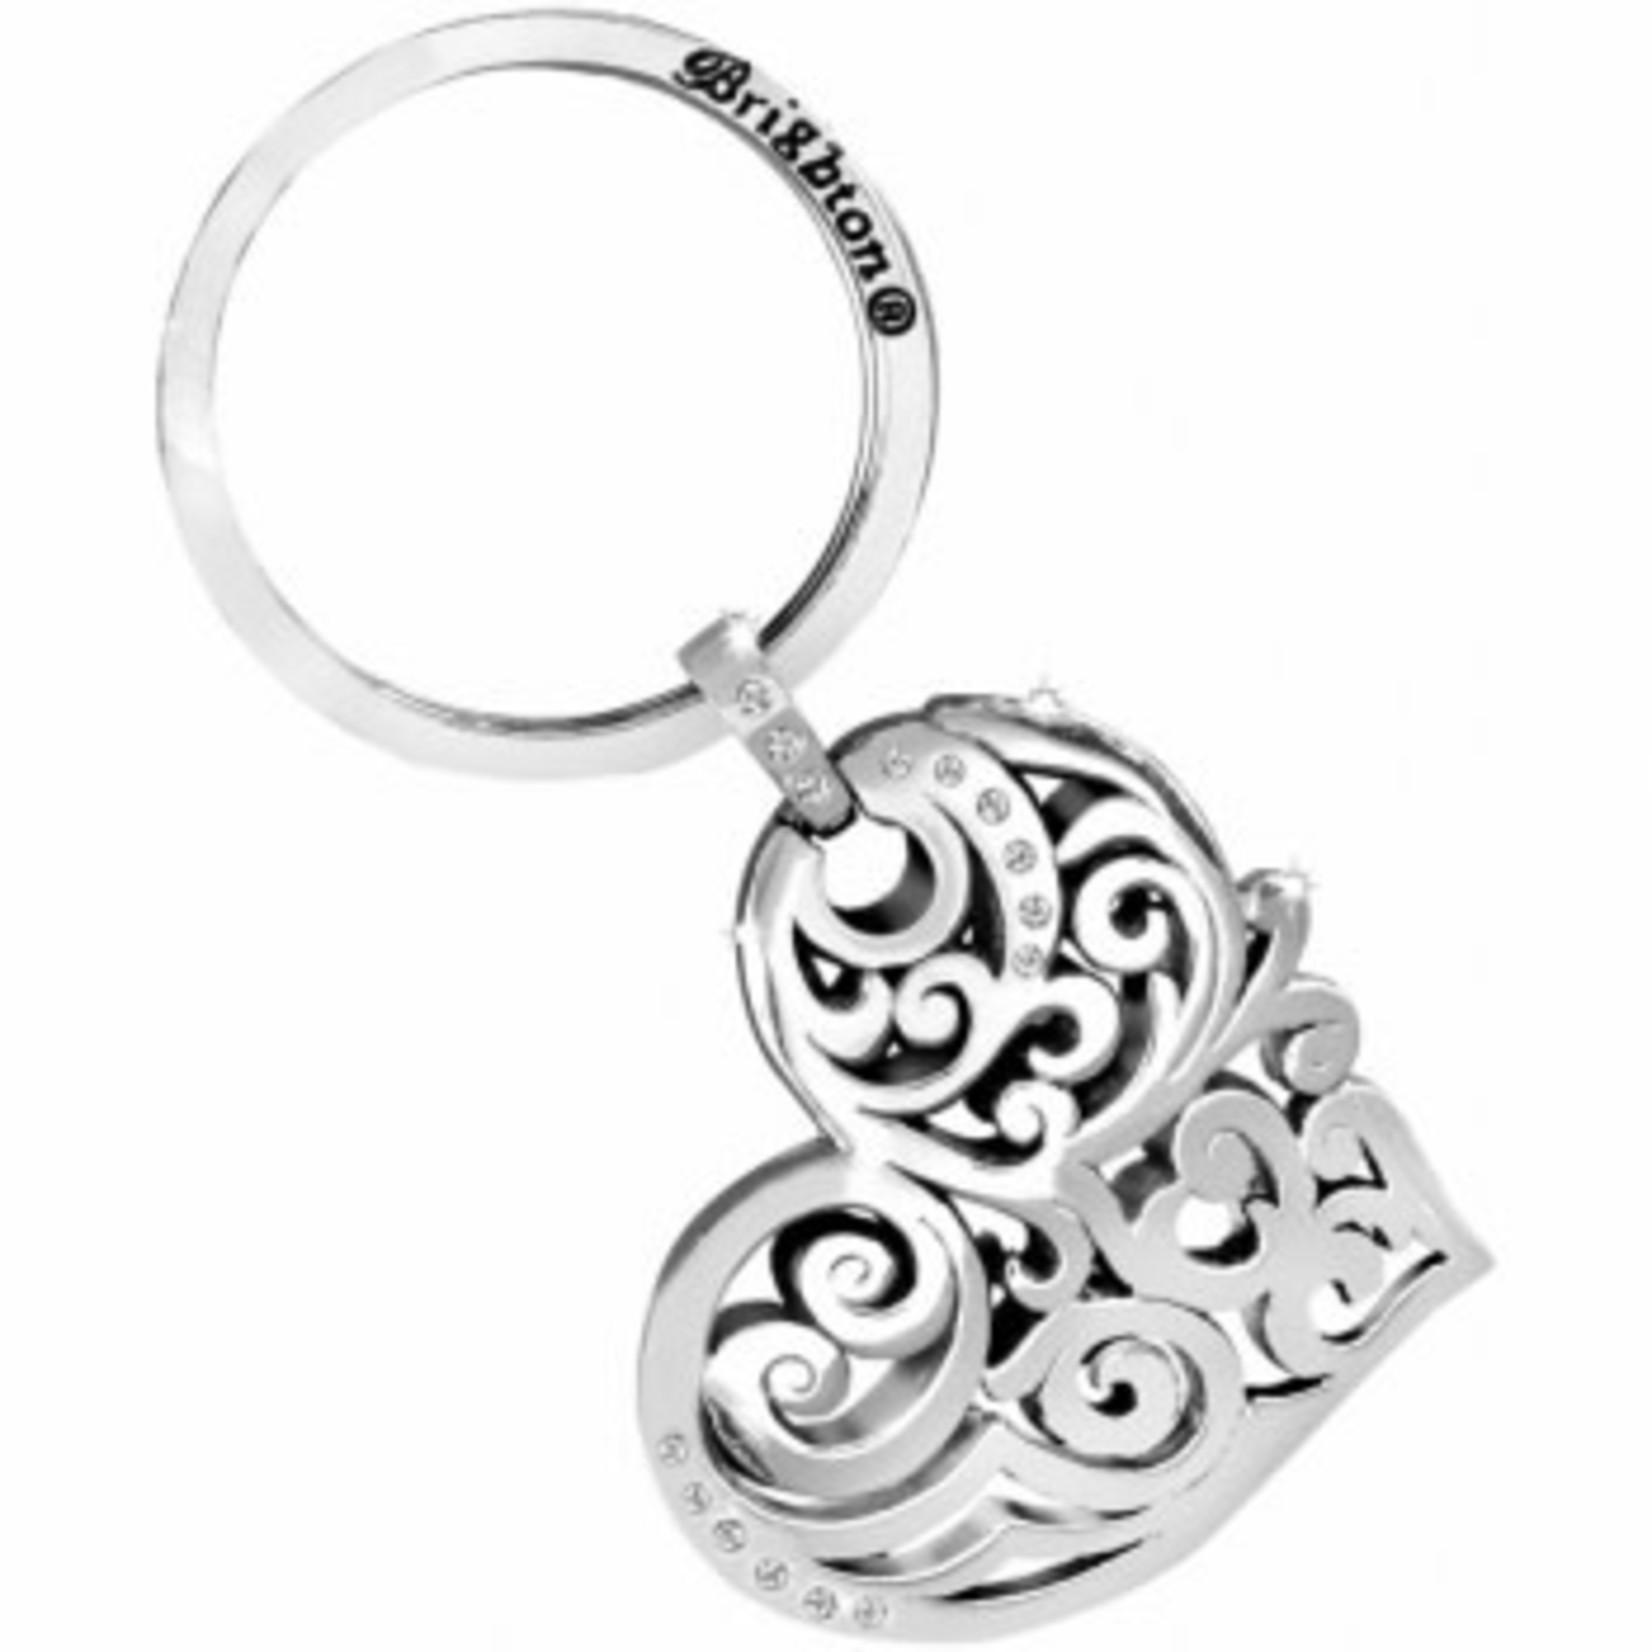 Brighton Madrid Heart Key Fob Silver